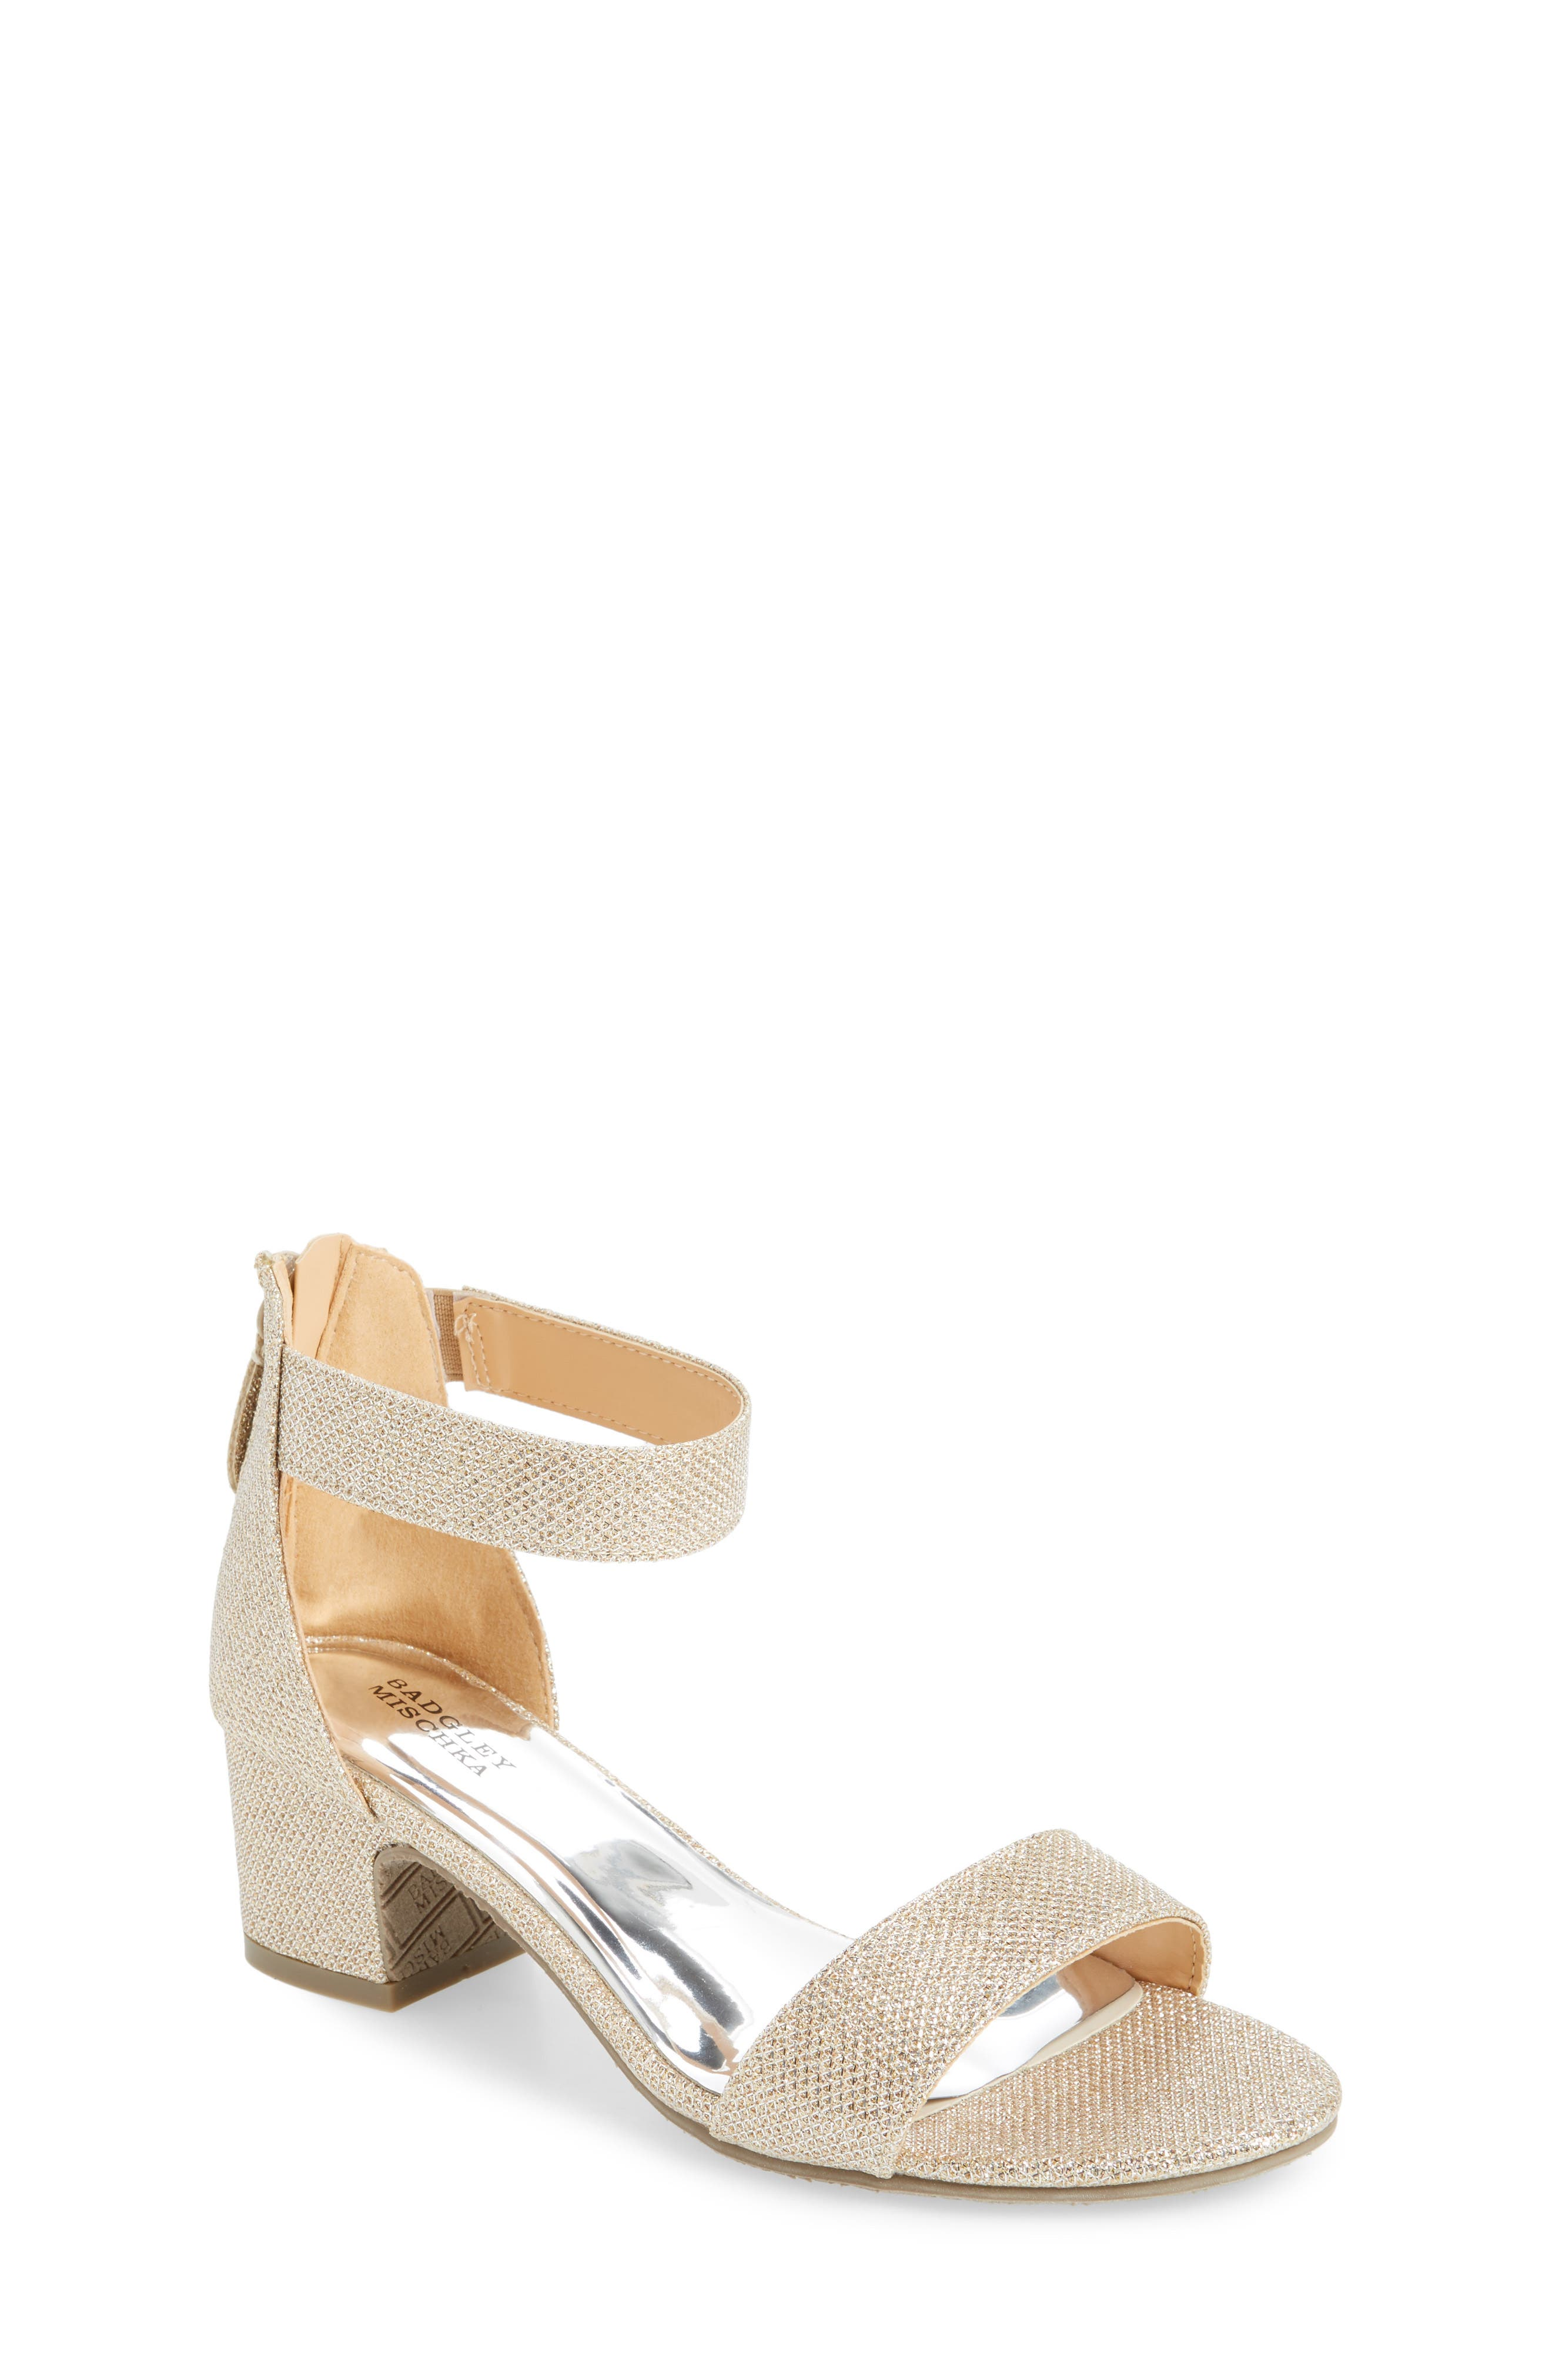 BADGLEY MISCHKA COLLECTION, Badgley Mischka Pernia Velma Shimmer Sandal, Main thumbnail 1, color, LIGHT GOLD SHIMMER